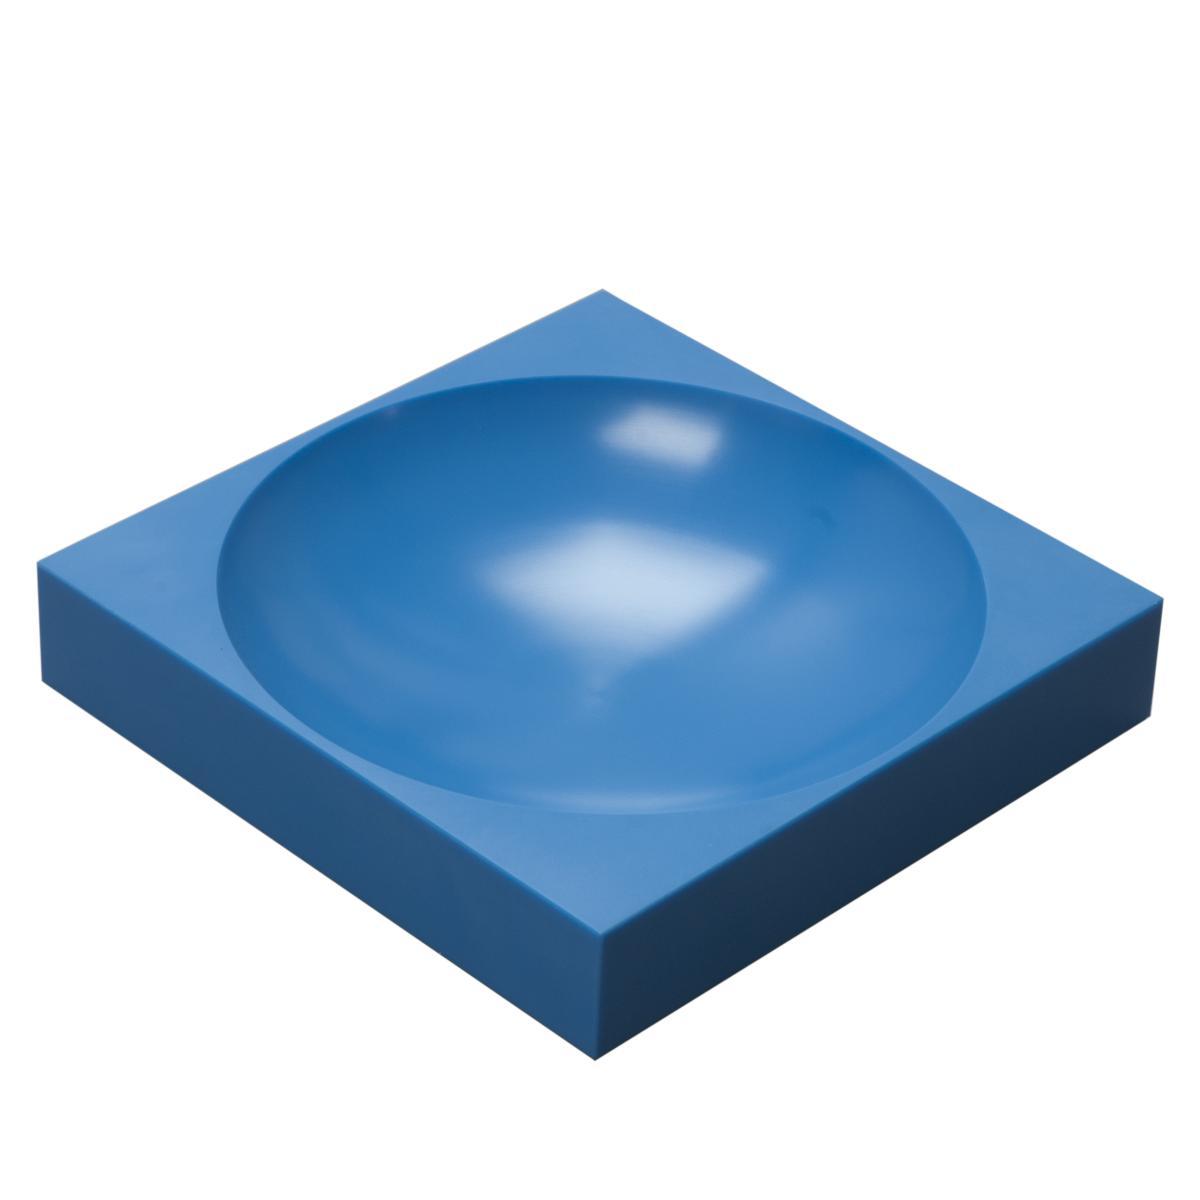 farmer-block Schalen mit Magnet, Modul 1, Jodhpur blau